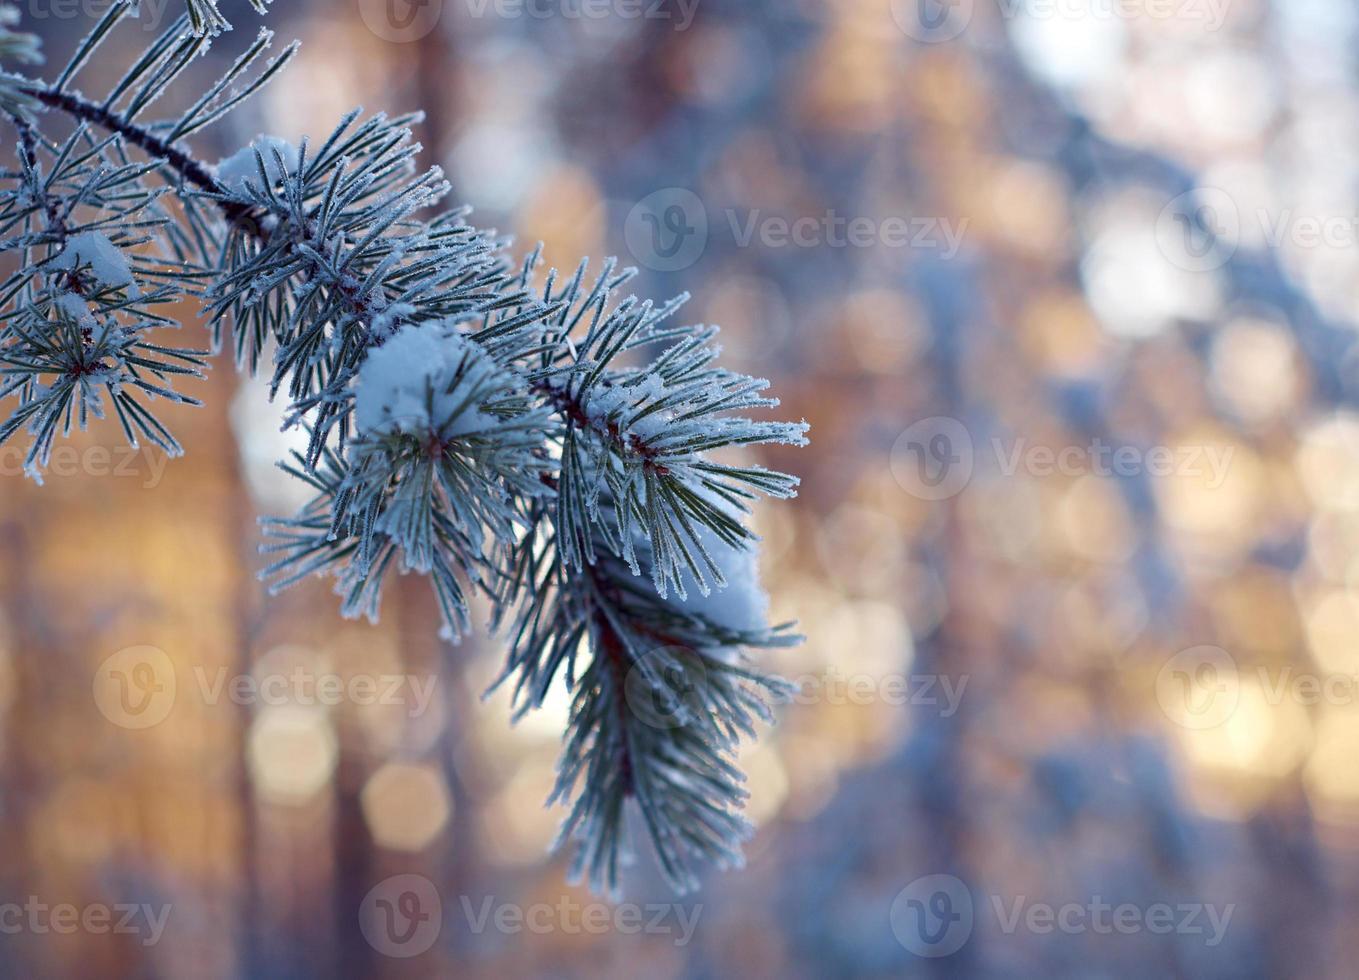 vinterlandskap. vinter scen foto